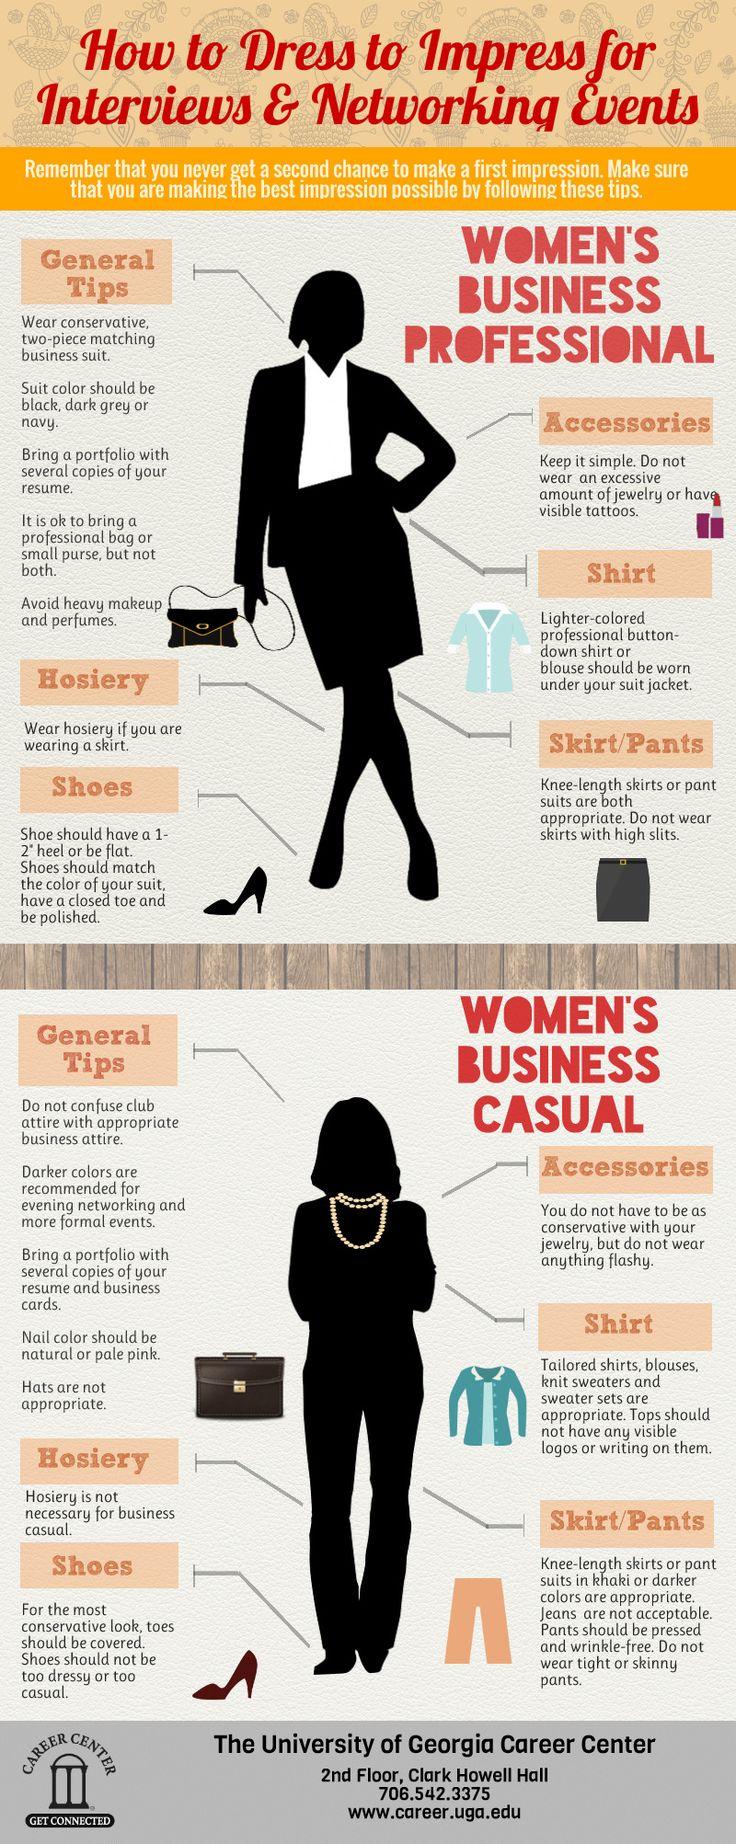 A guide for women on #BusinessCasual & #BusinessProfessional attire.   #DressForSuccess